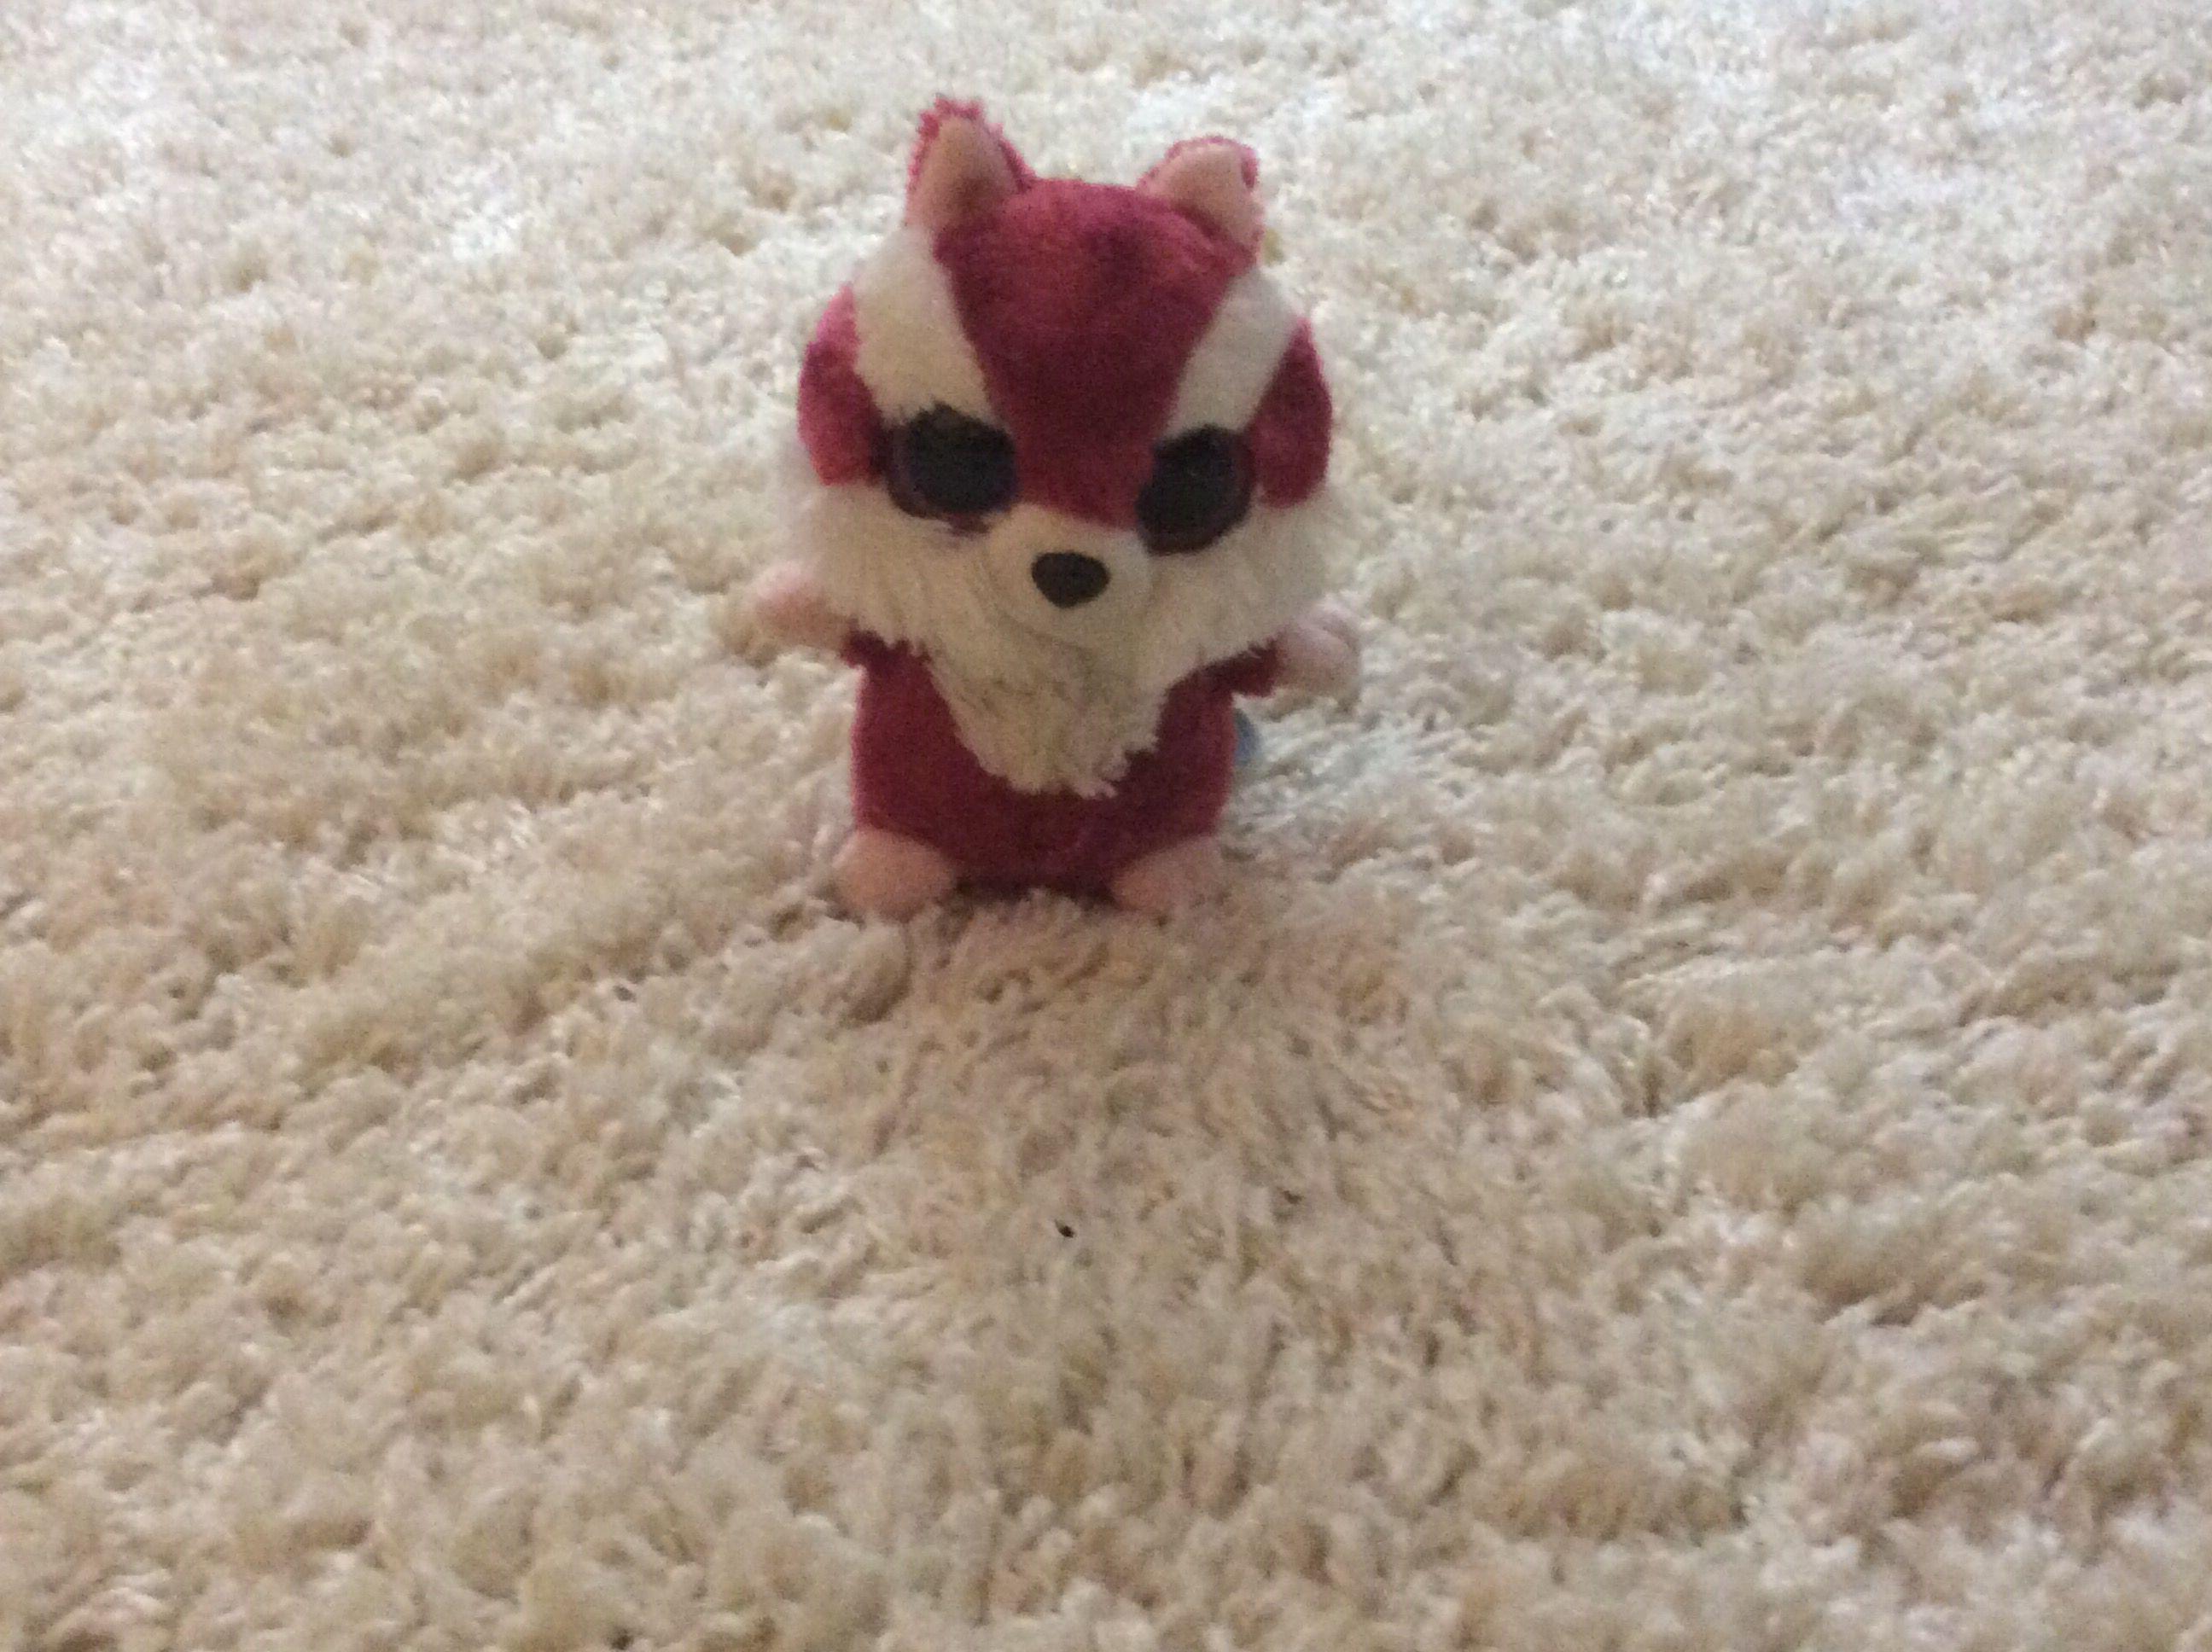 Red Squirrel Cute Stuffed Animals Red Squirrel Beanie Boos [ 1936 x 2592 Pixel ]